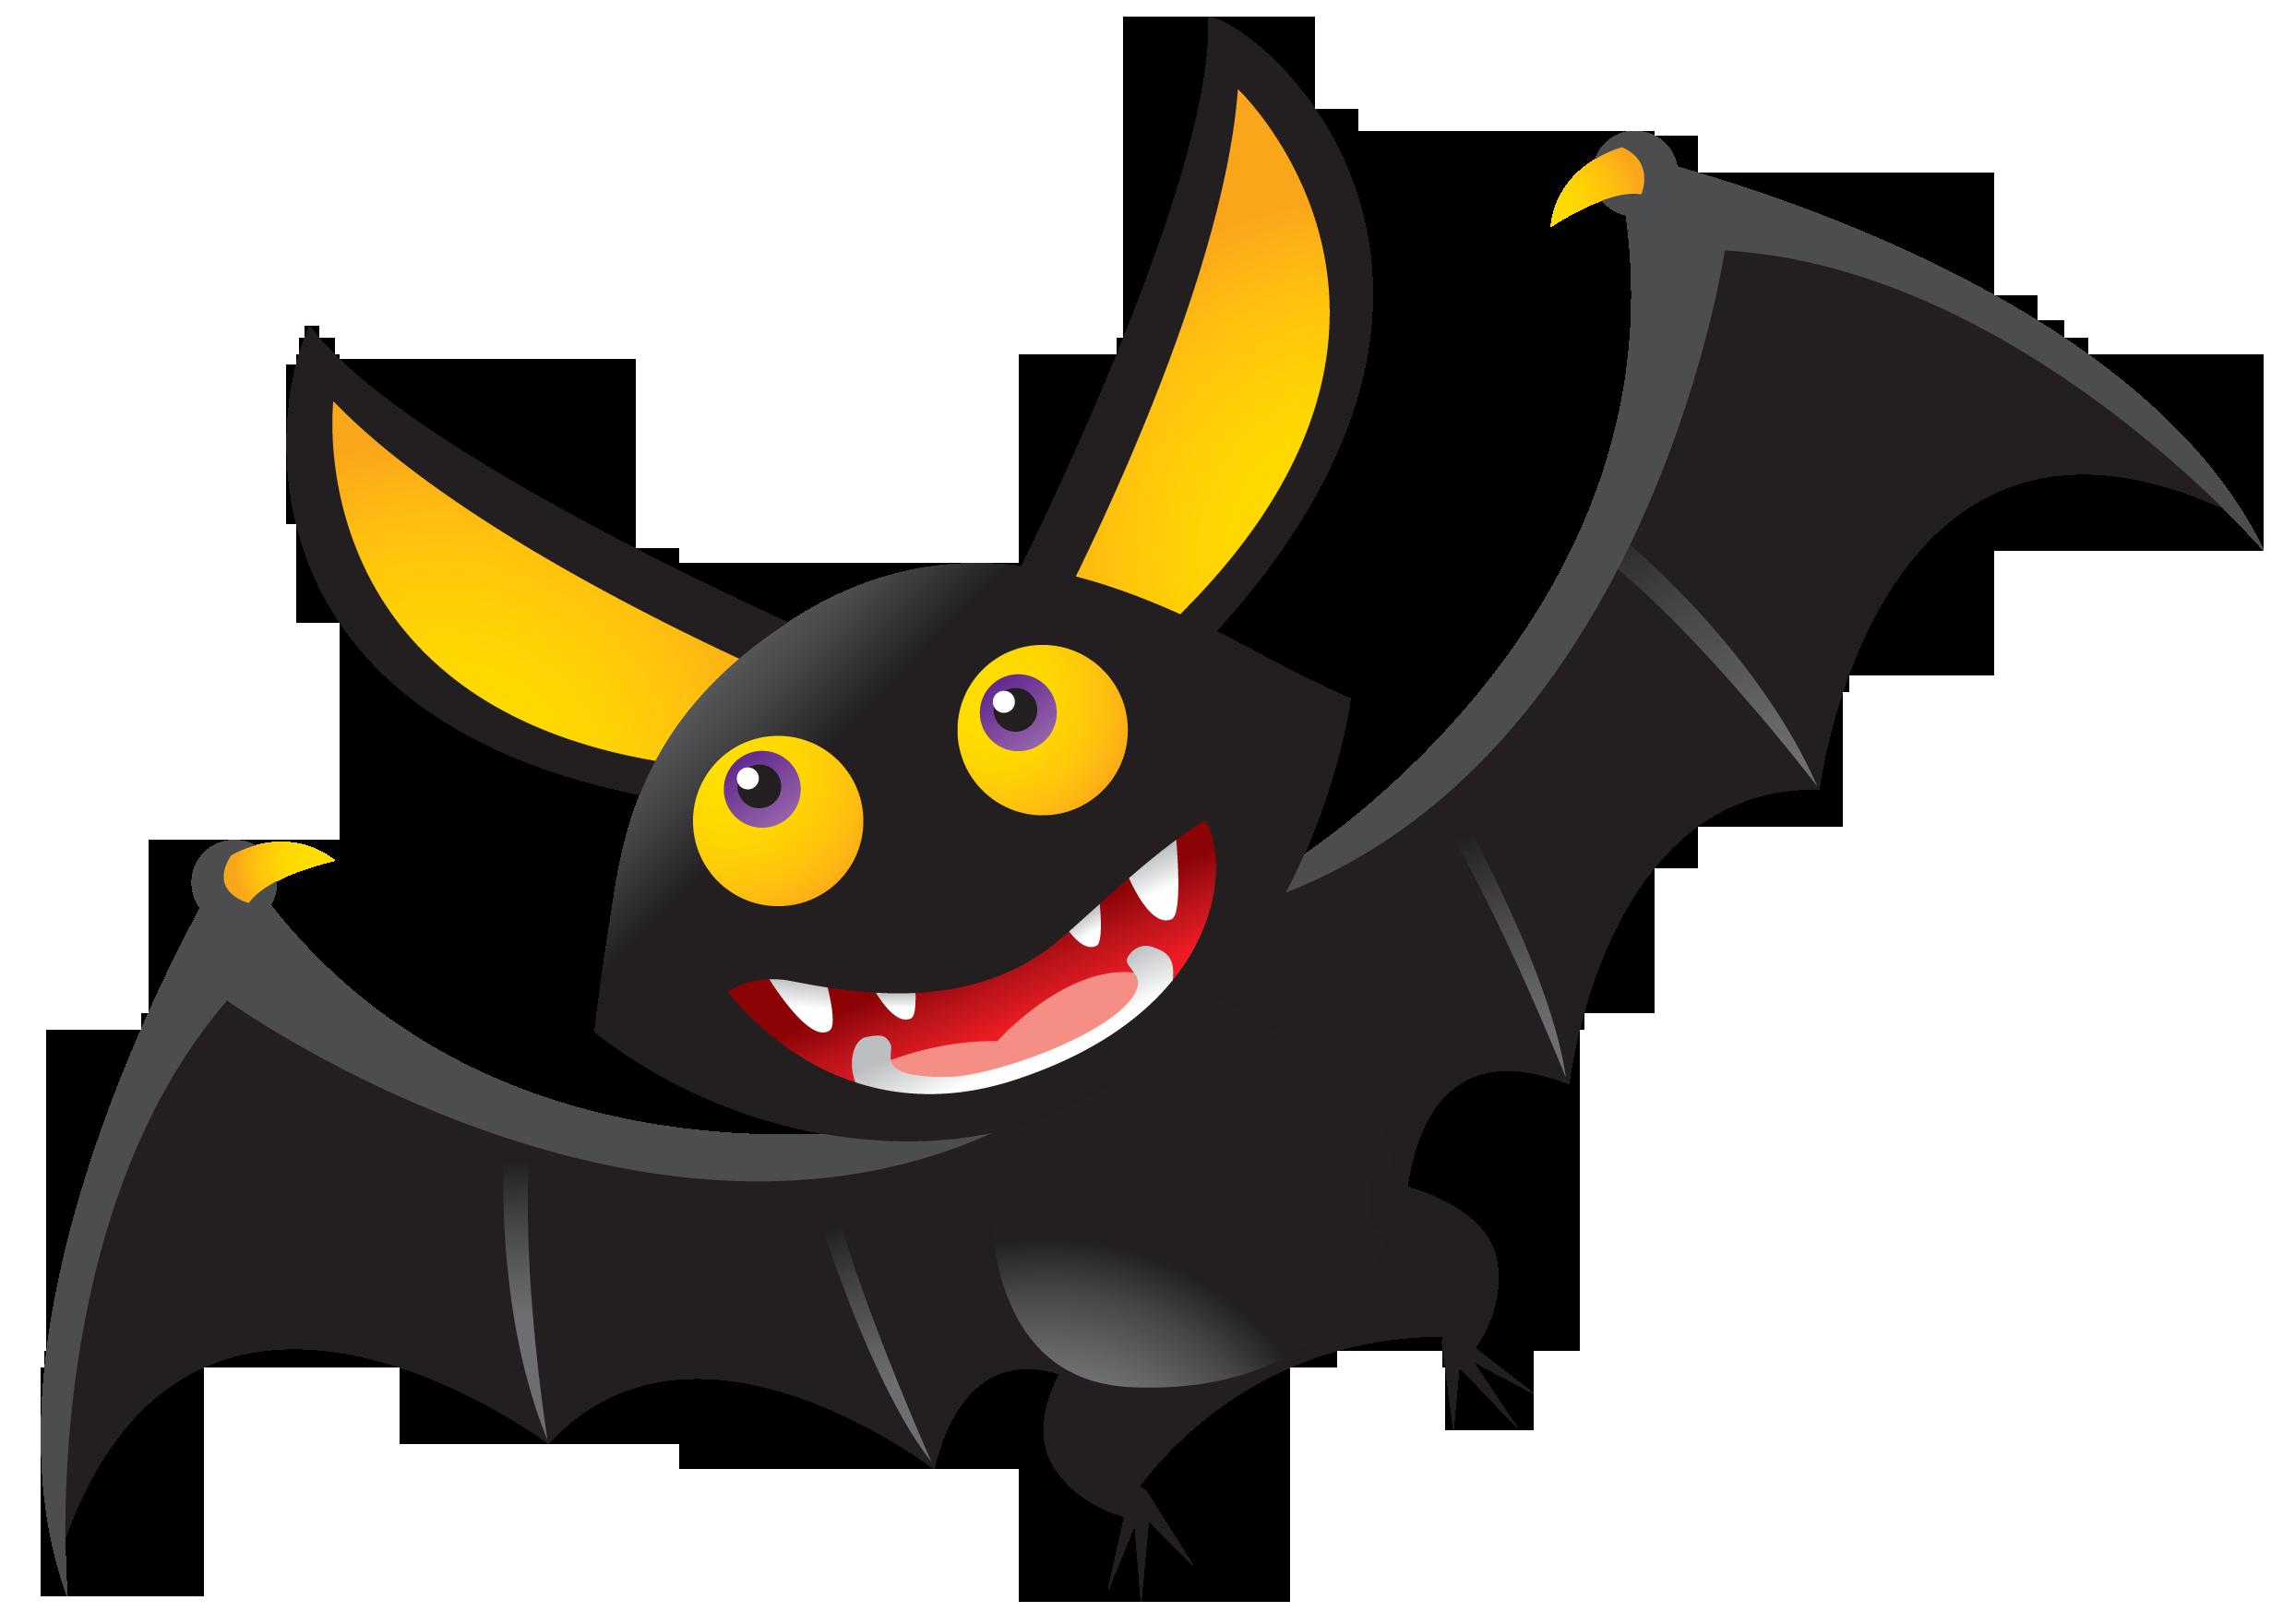 2474x1760 Haunted House Clipart Cute Halloween Bat